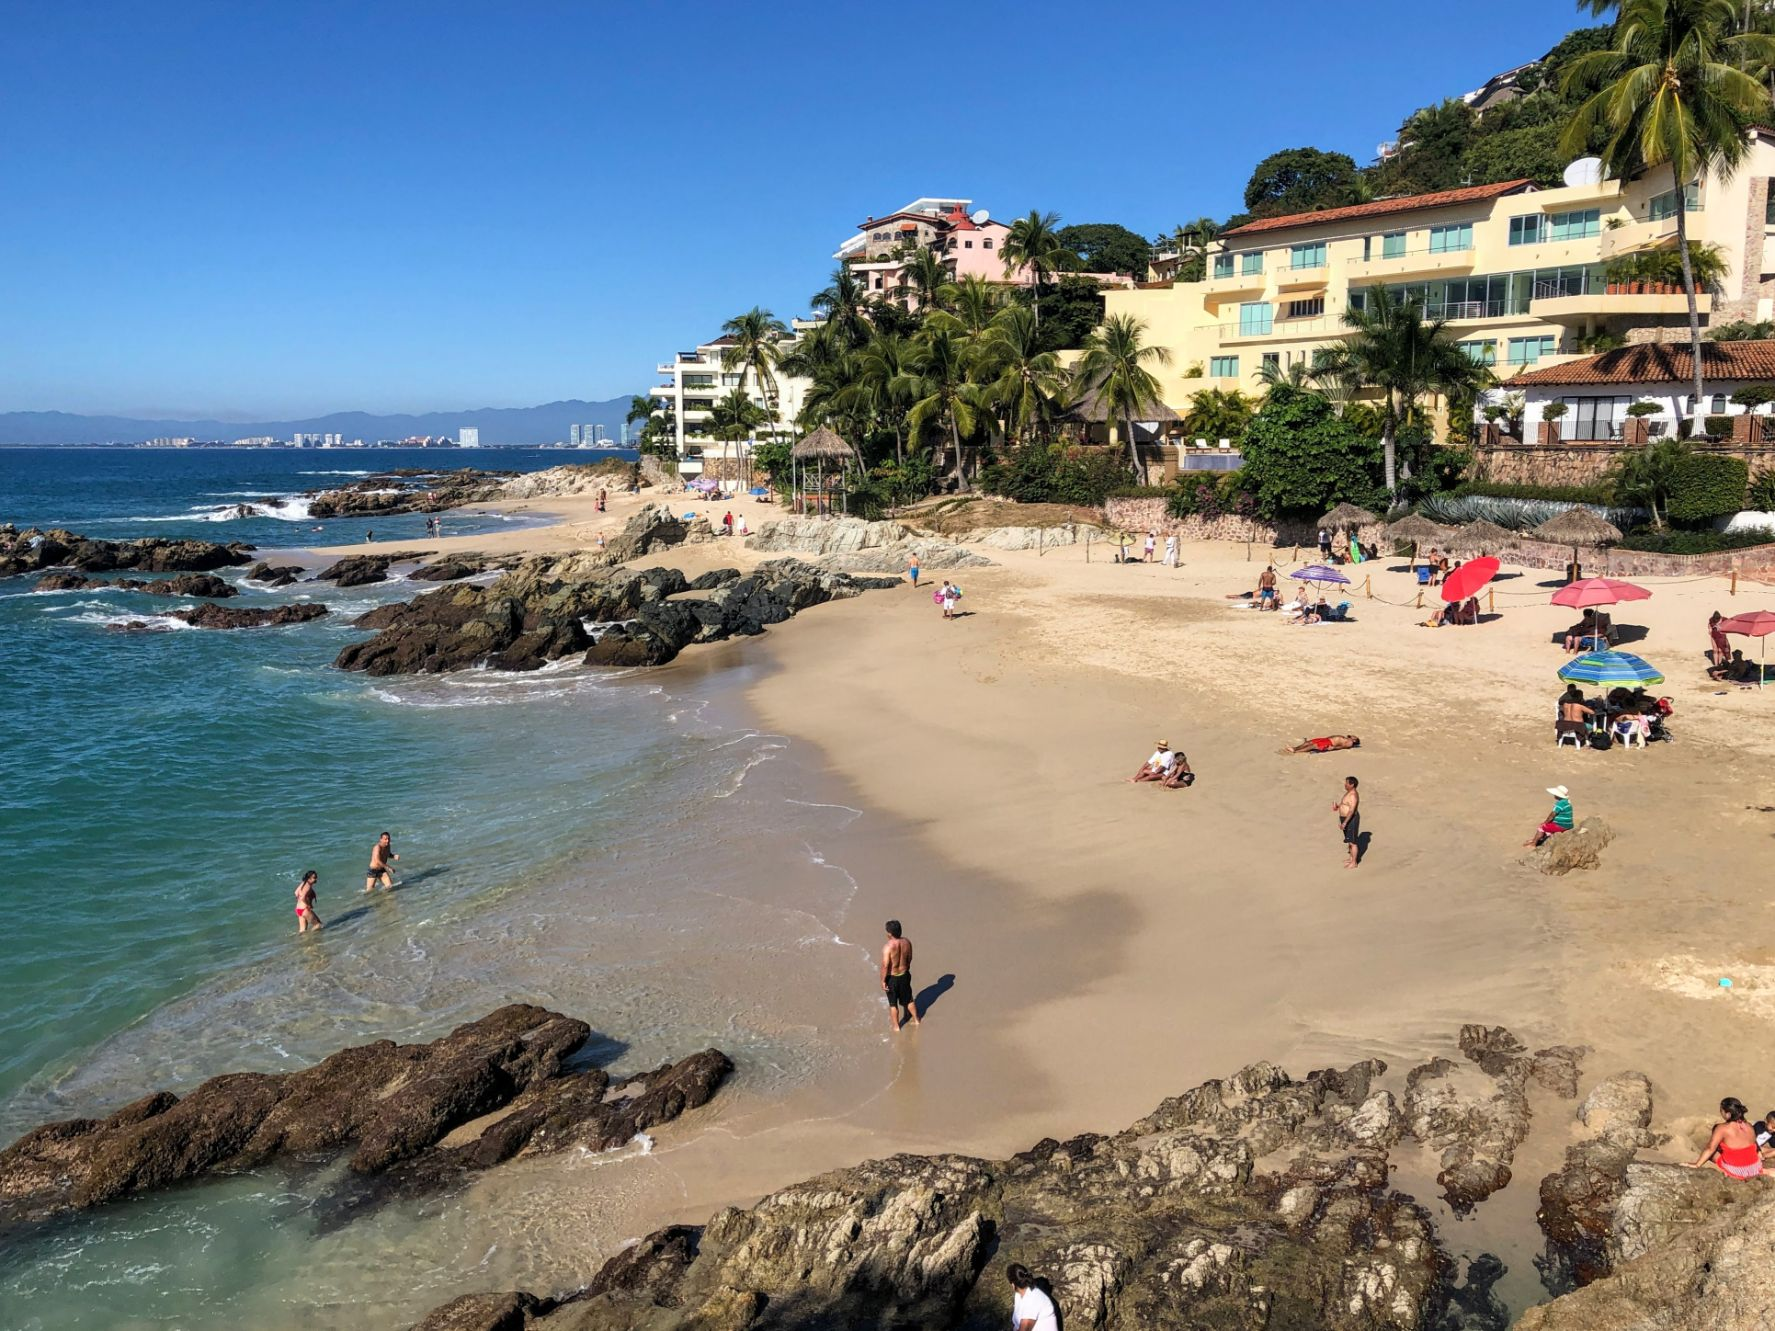 Conchas Chinas Beach in Puerto Vallarta